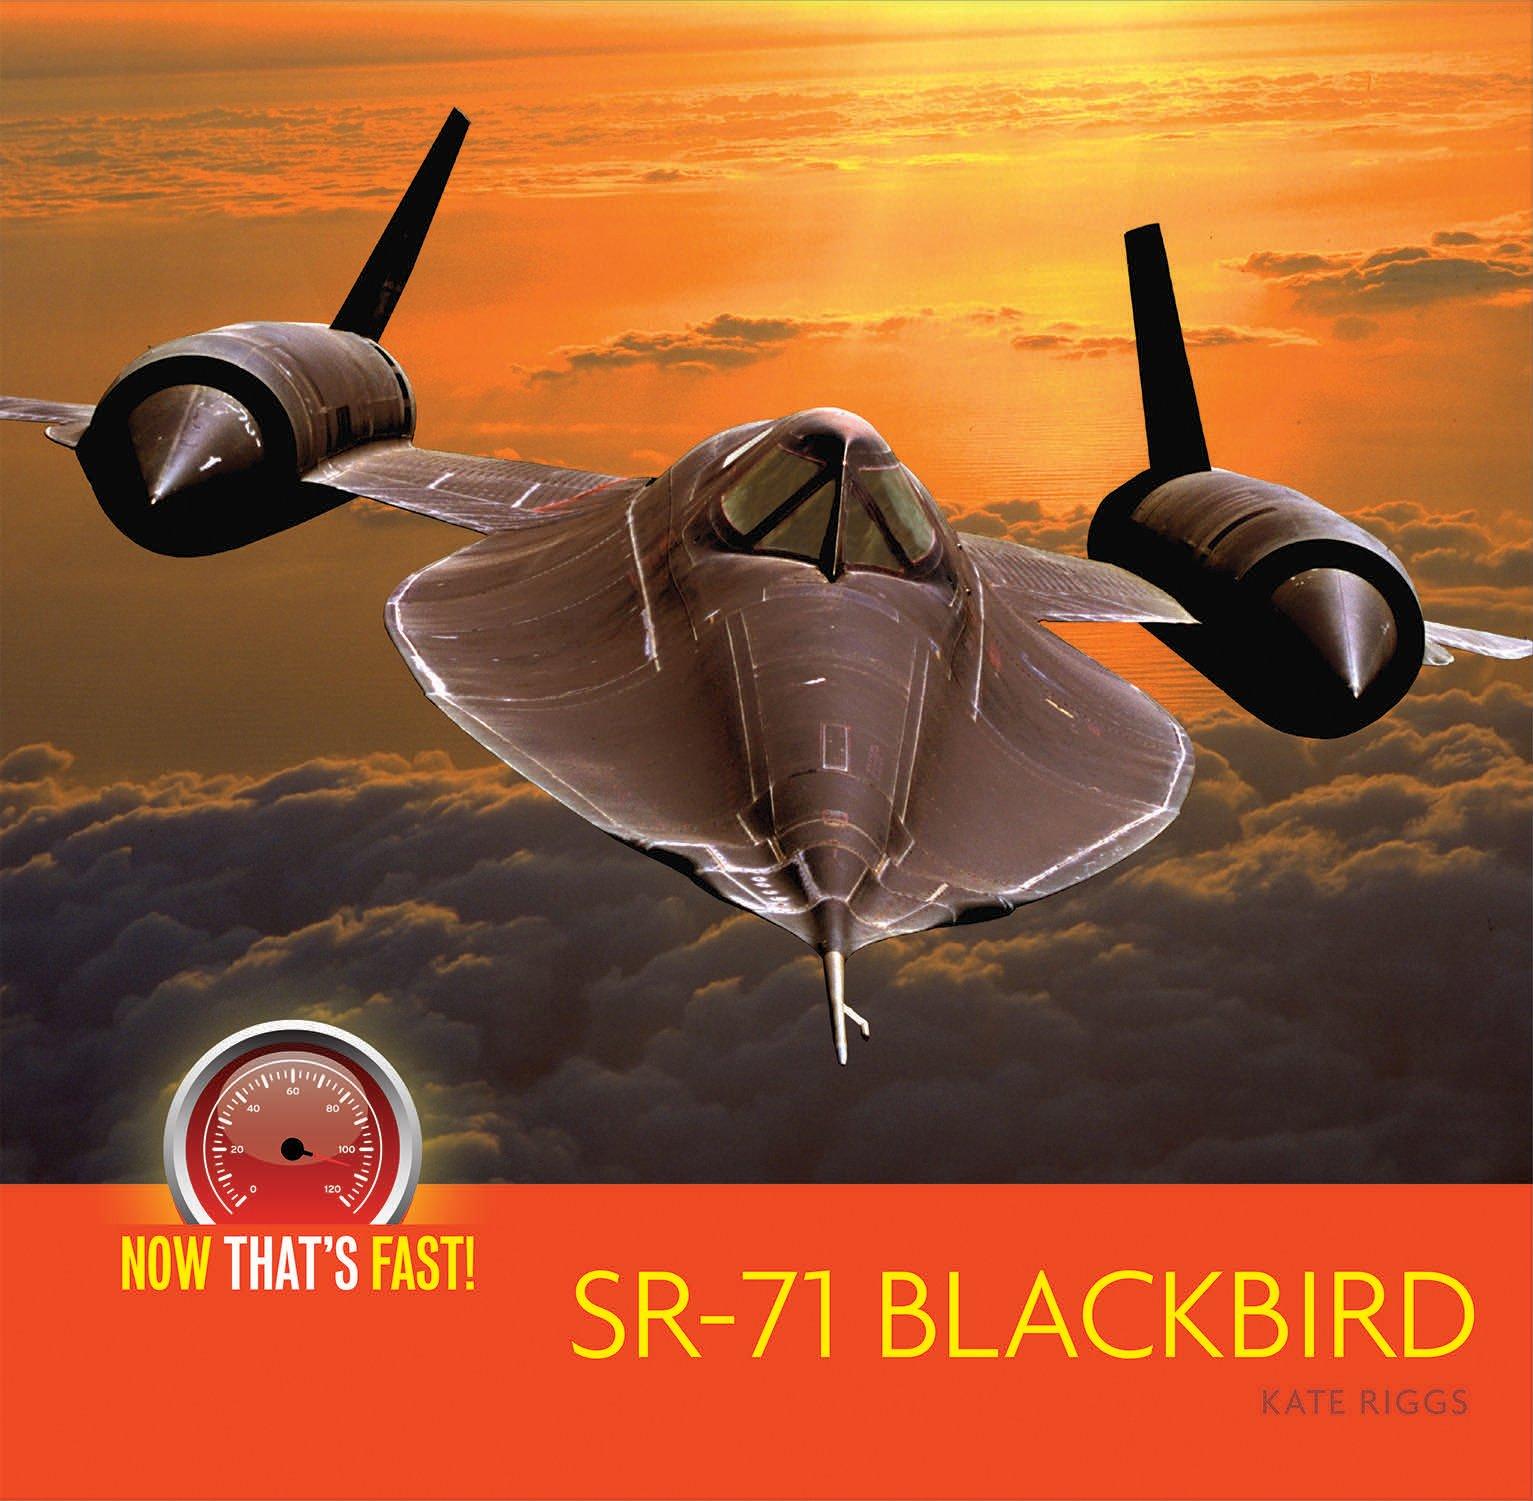 SR-71 Blackbird (plane) (Now That's Fast!) Paperback – August 28, 2018